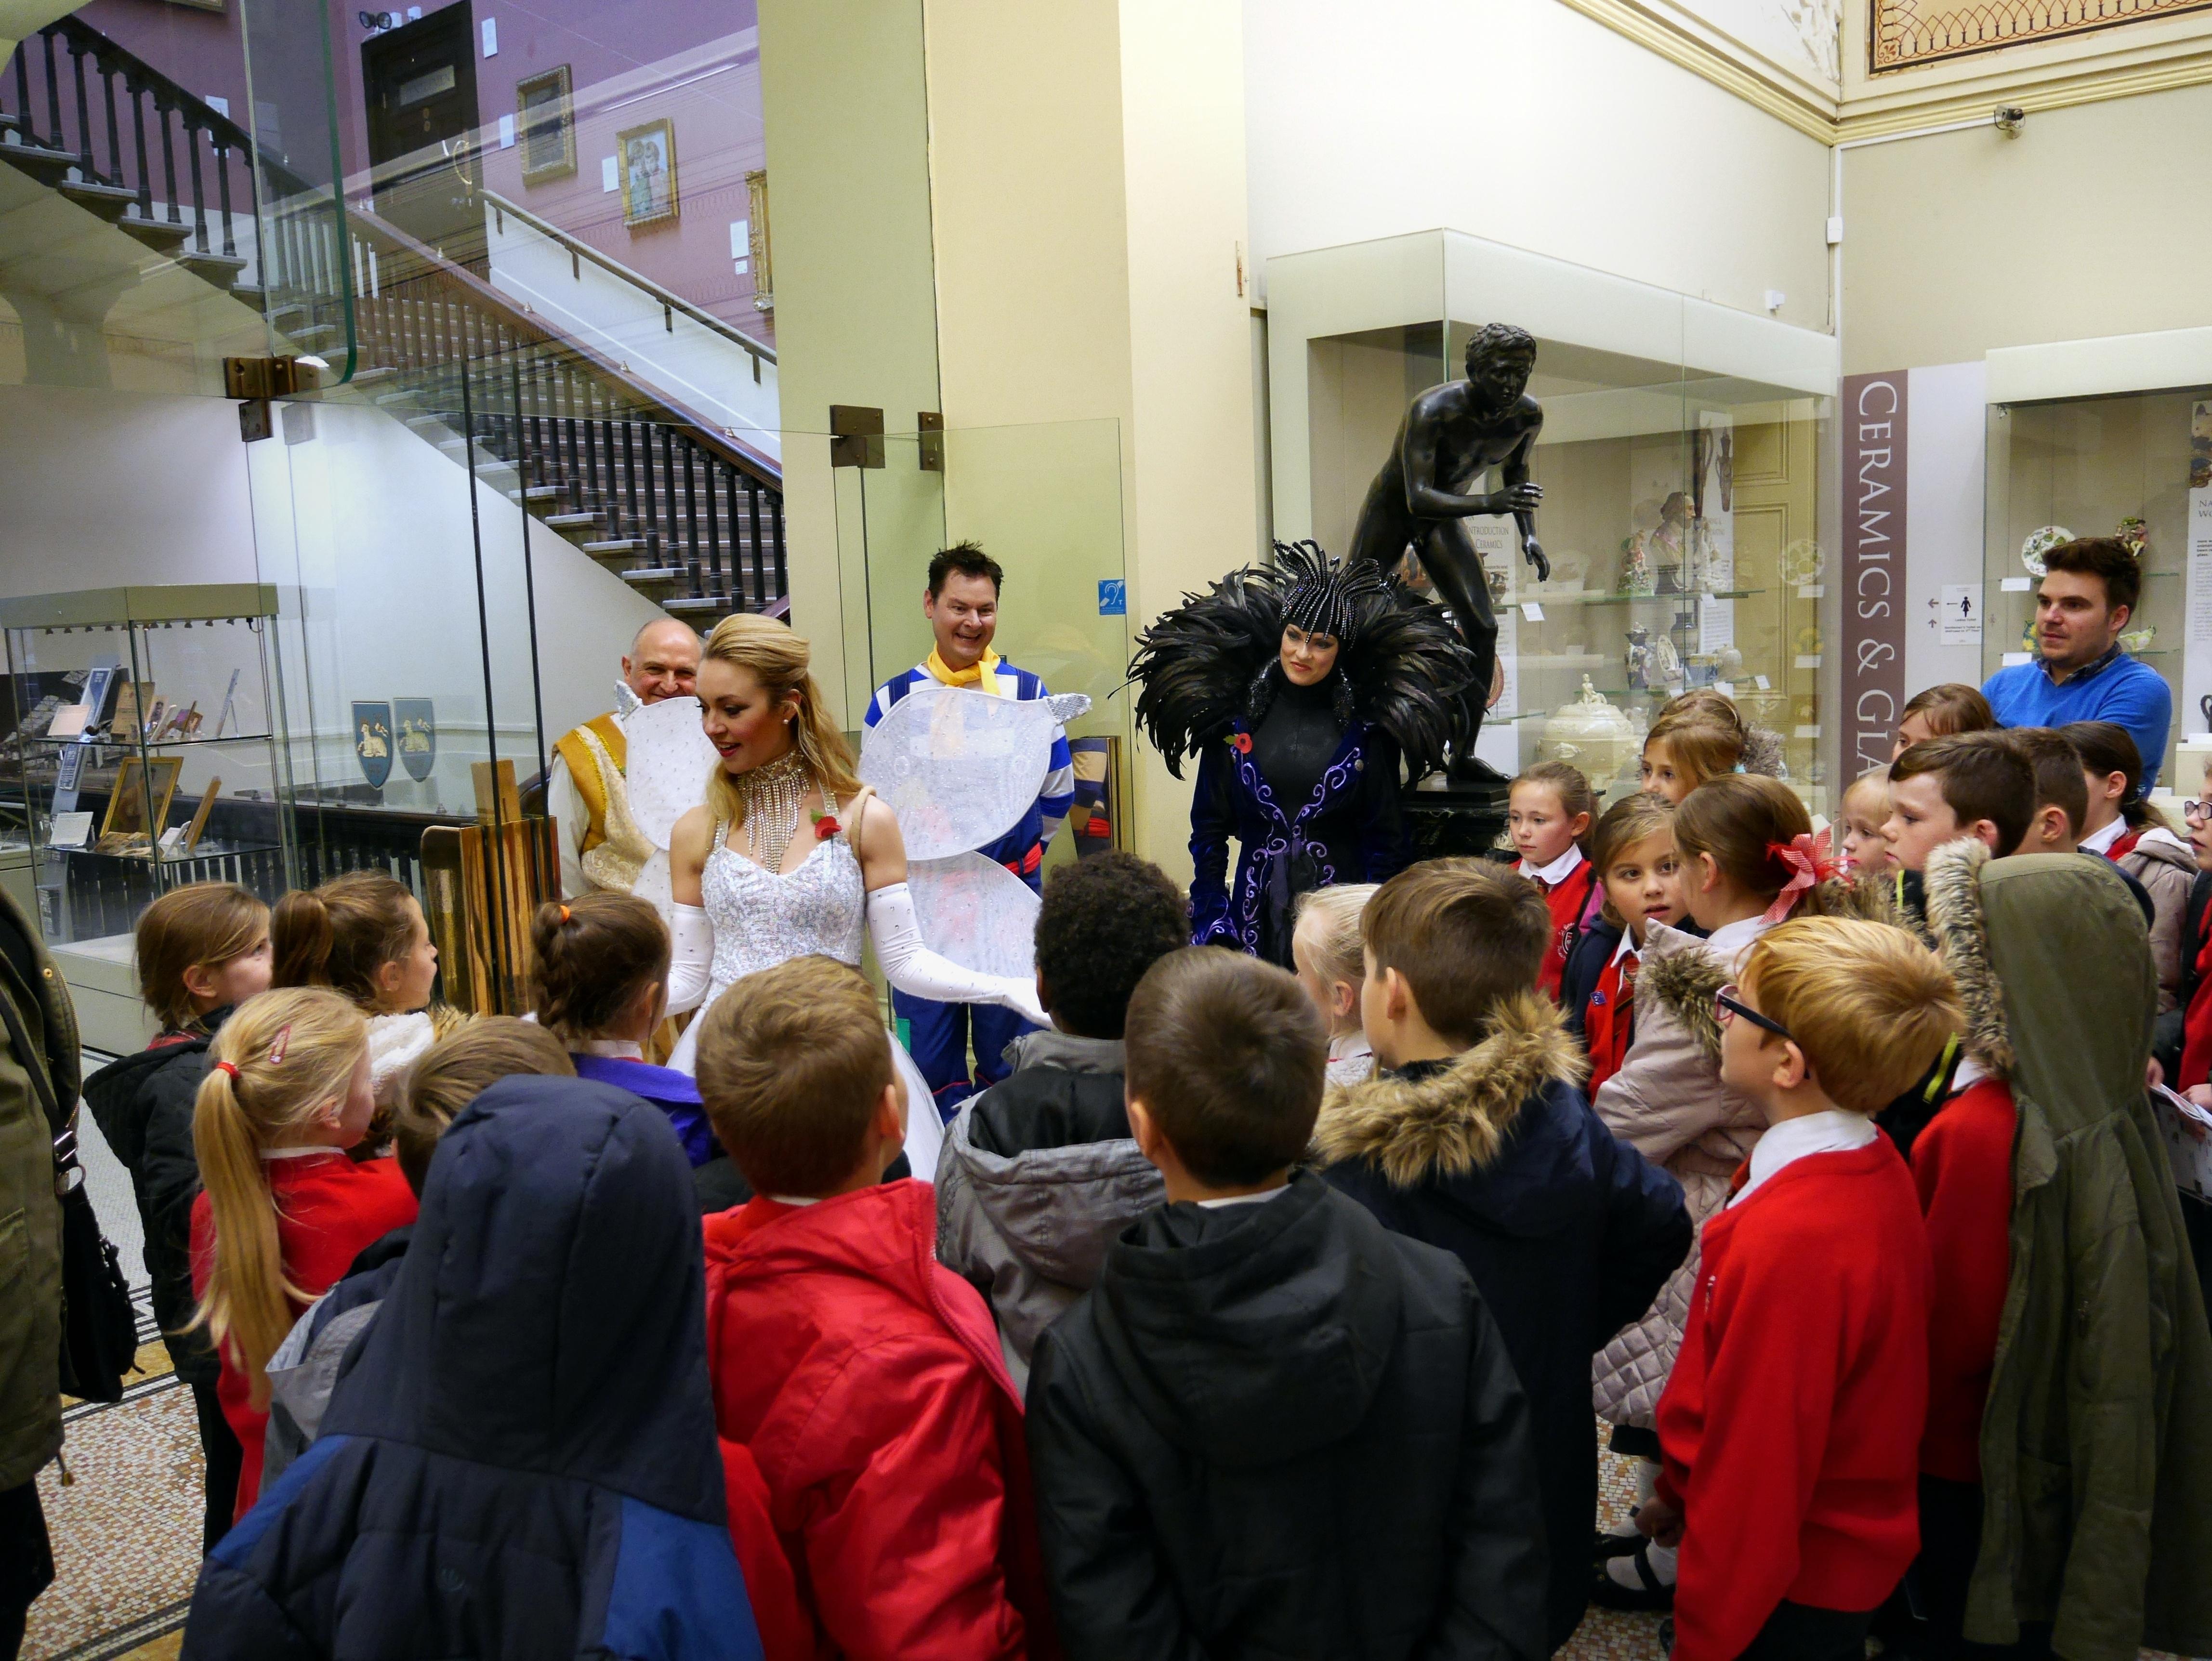 The good fairy (Hayley Hassall) talking to the children of St. Bernard's